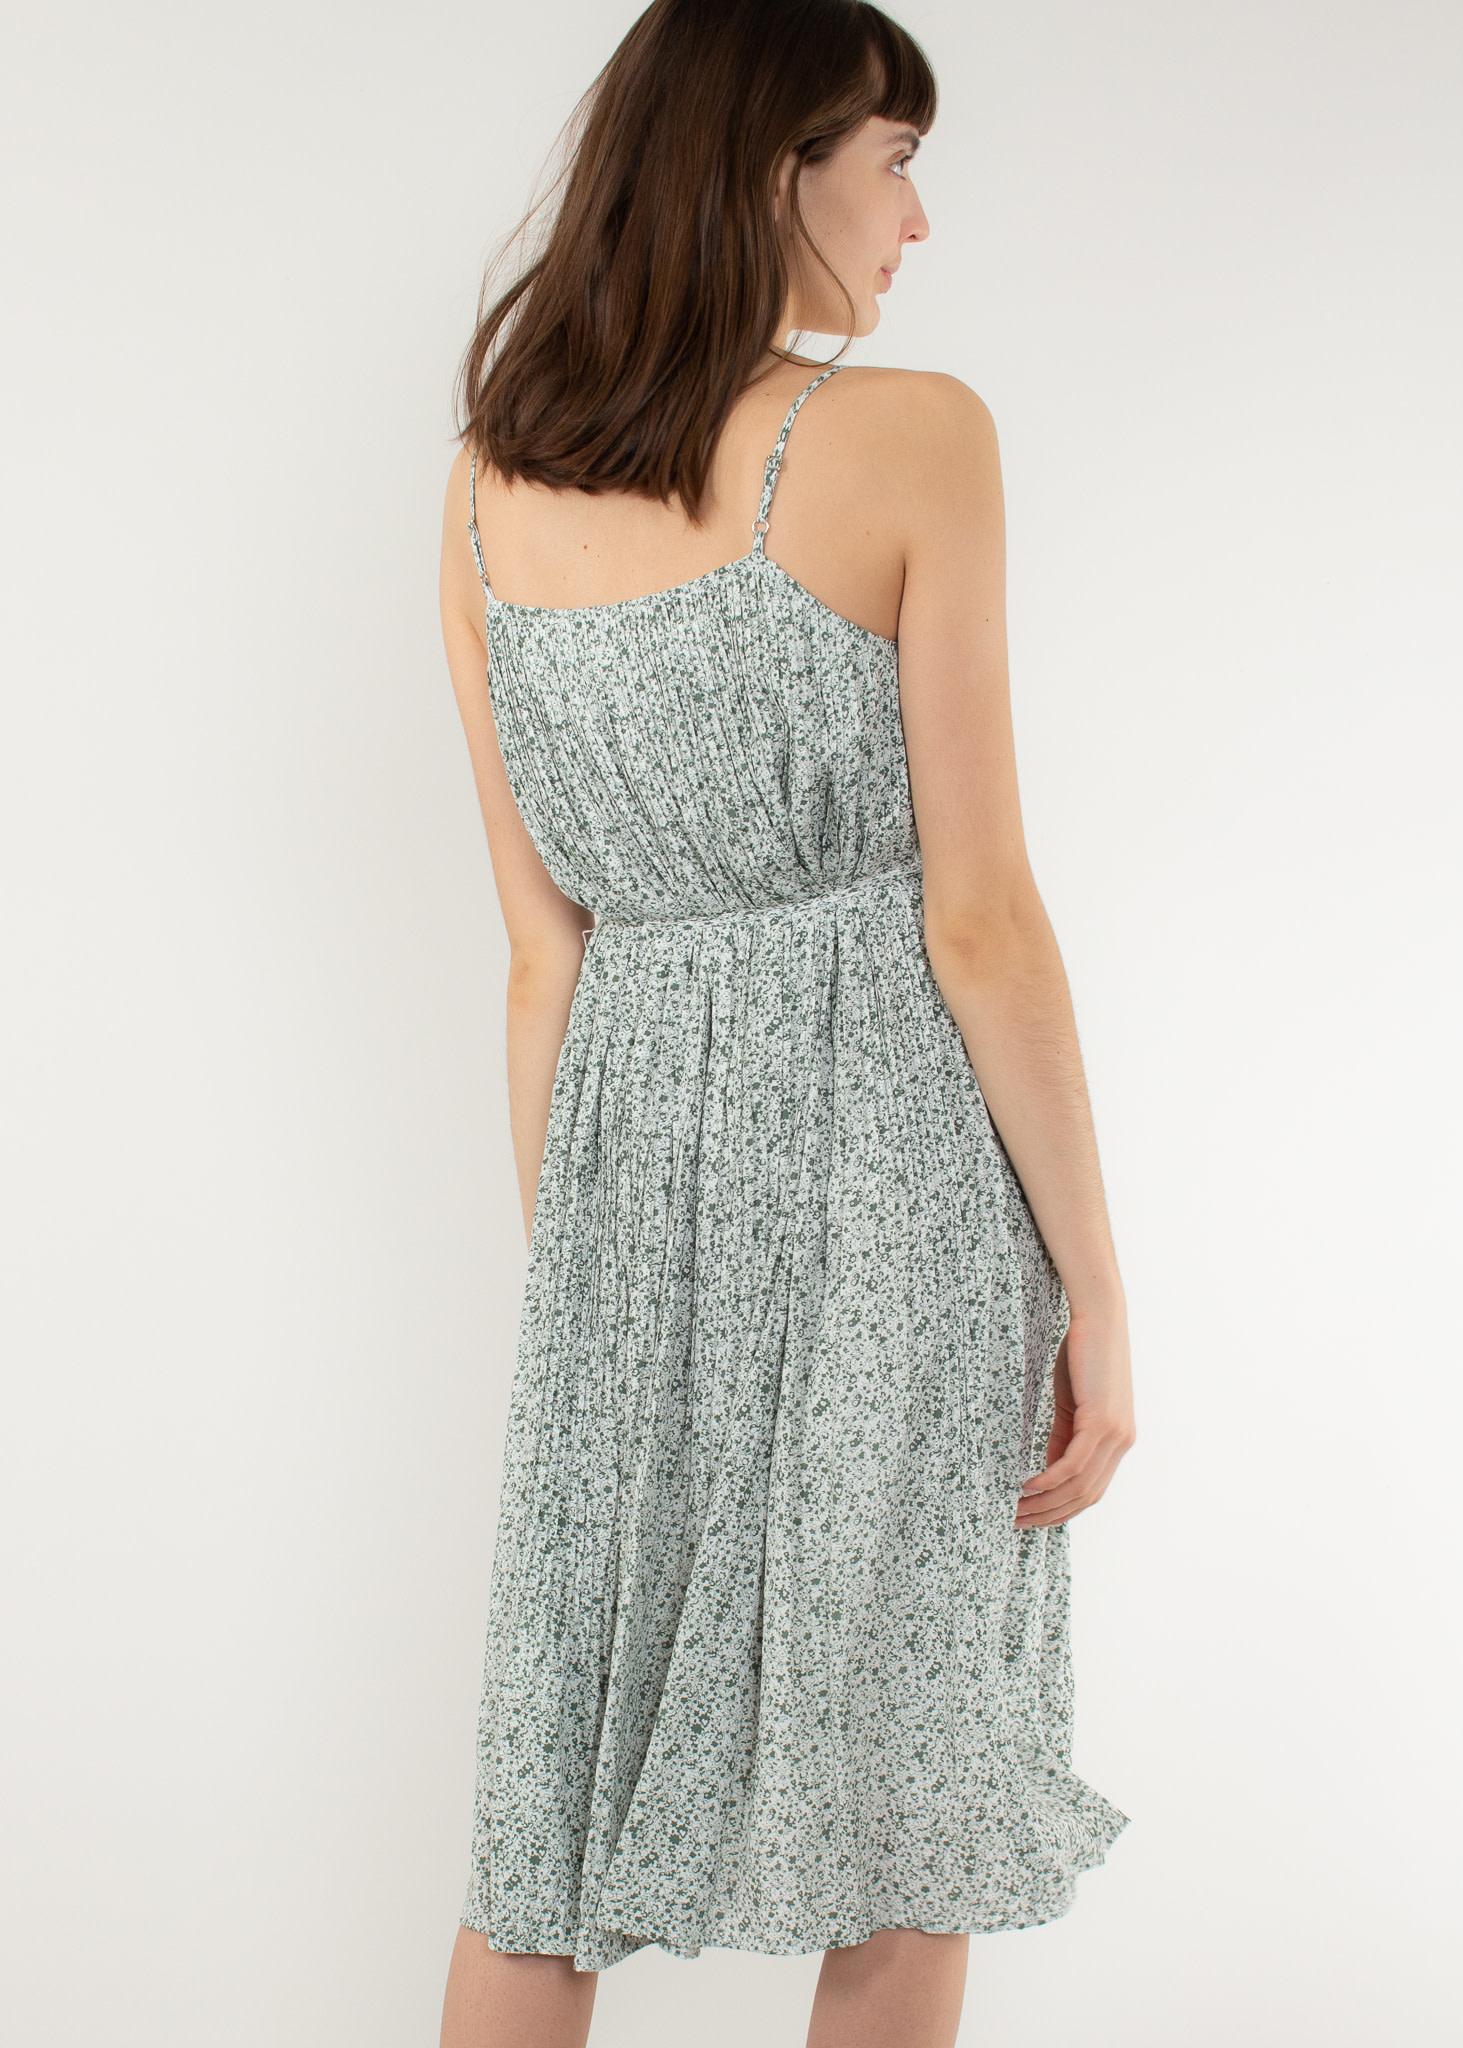 The Korner 20126044 dress